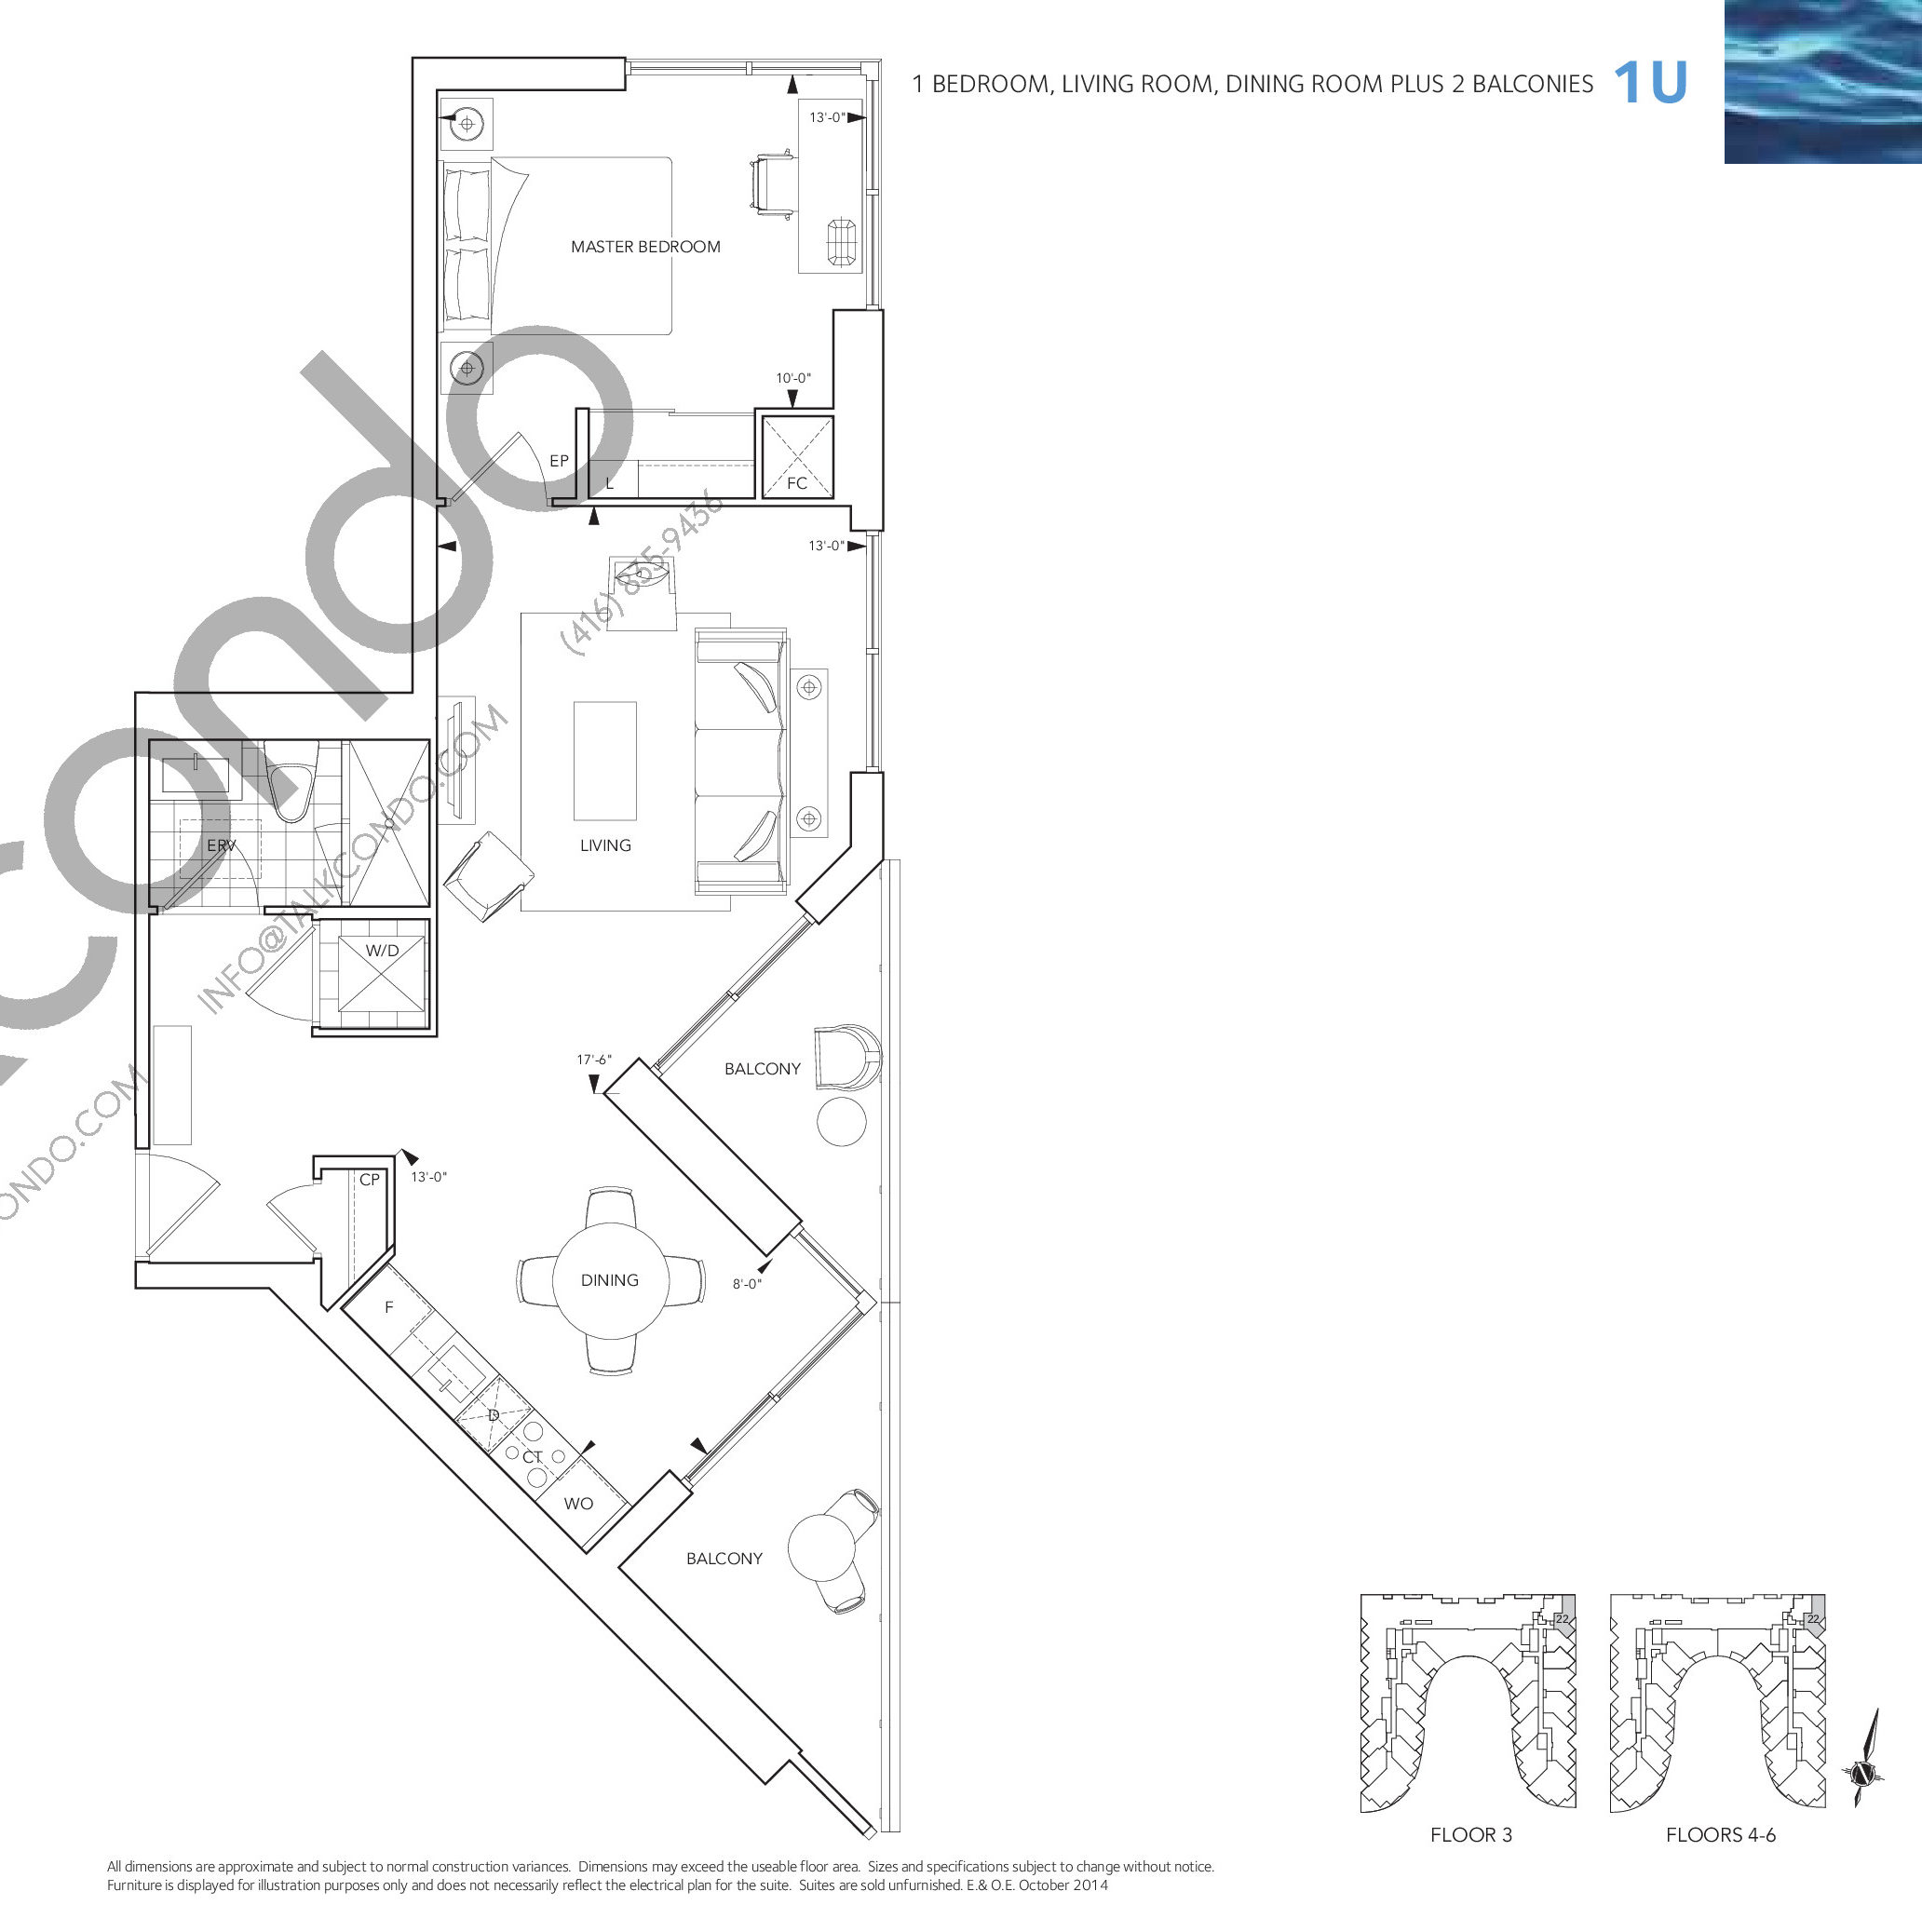 Aquavista At Bayside Condos Floor Plans Prices Availability Wiring Schematic Diagram October 2014 Quick View